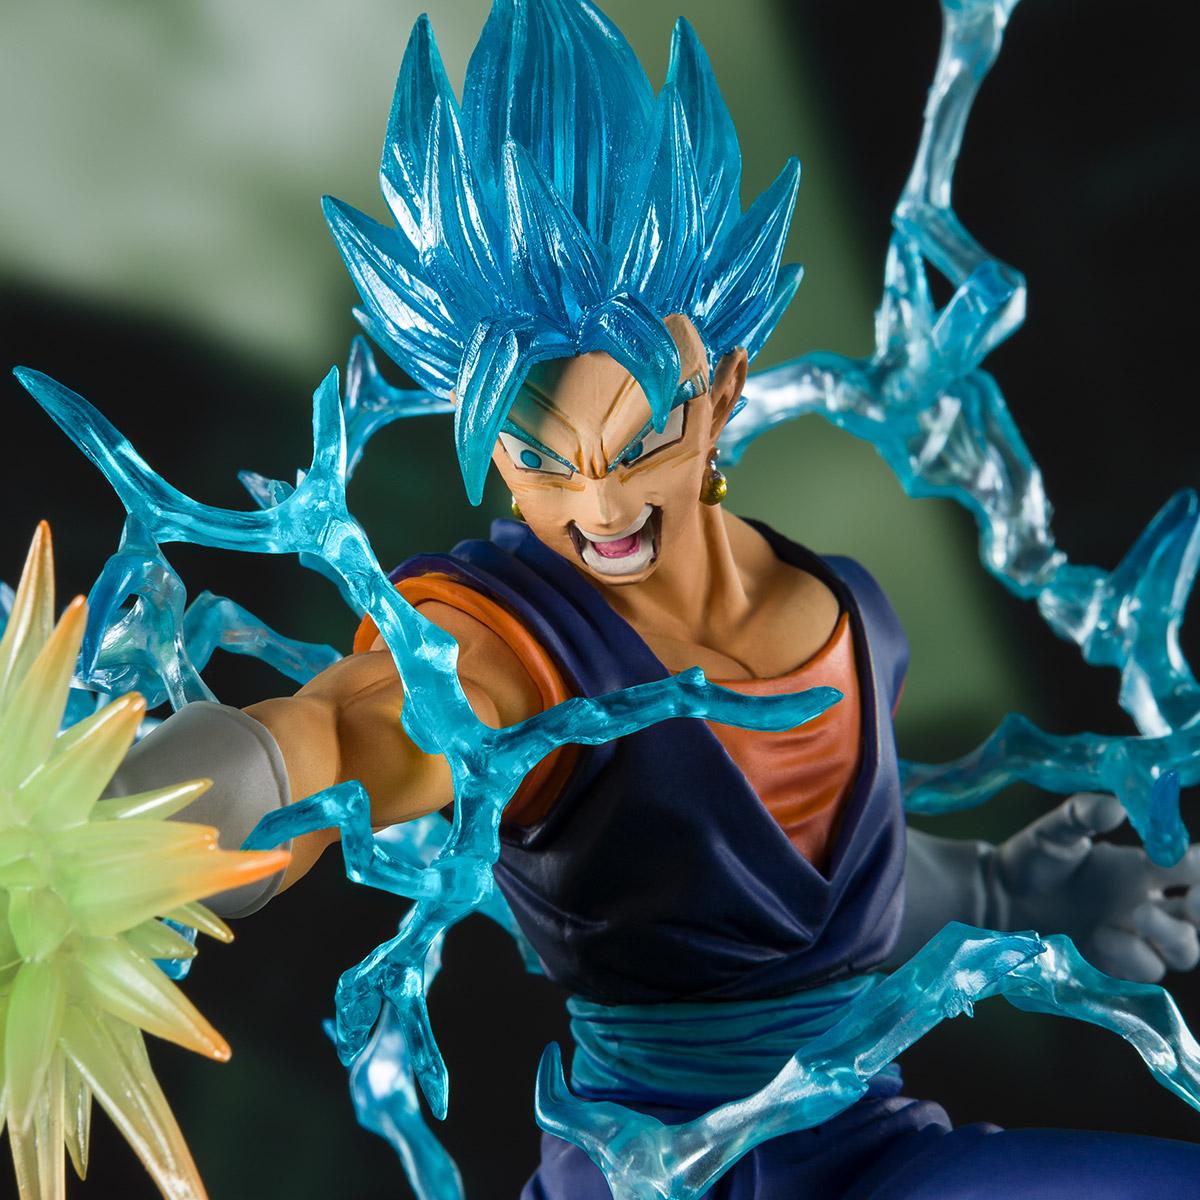 Figuarts ZERO SUPER SAIYAN GOD SUPER SAIYAN VEGITO-Event Exclusive Color Edition-